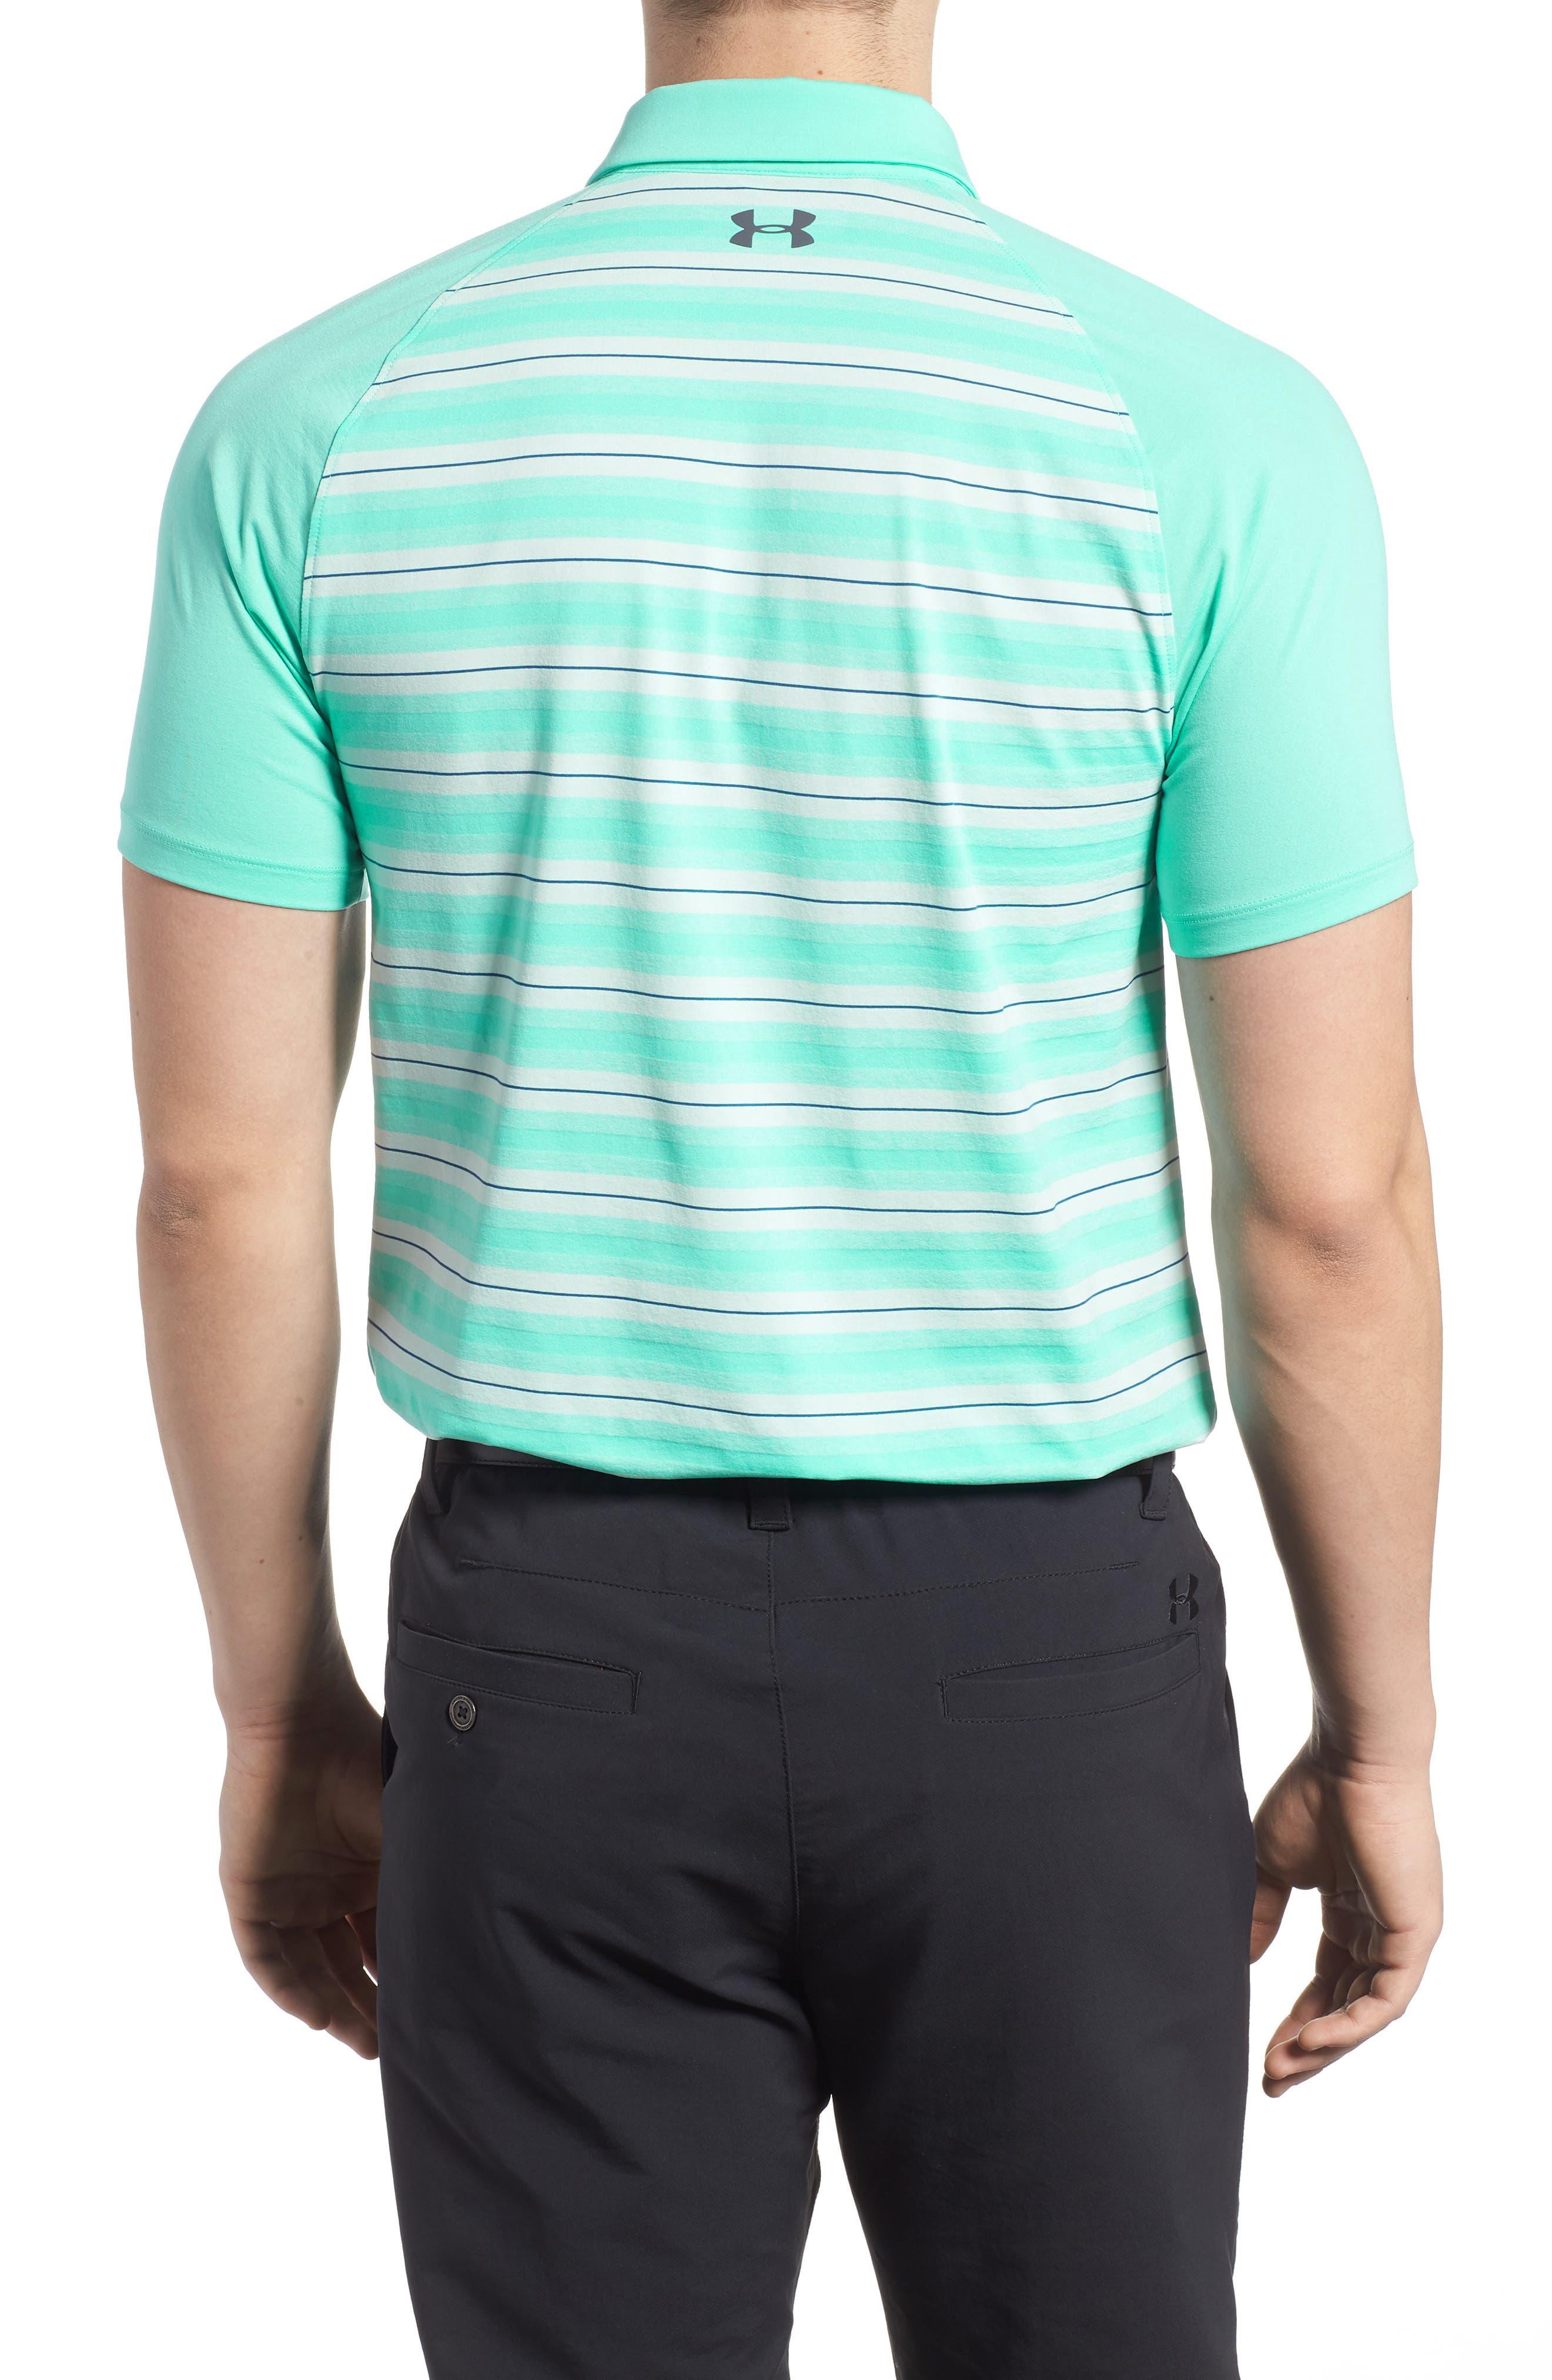 Alternate Image 2  - Under Armour Threadborne Boundless Regular Fit Polo Shirt